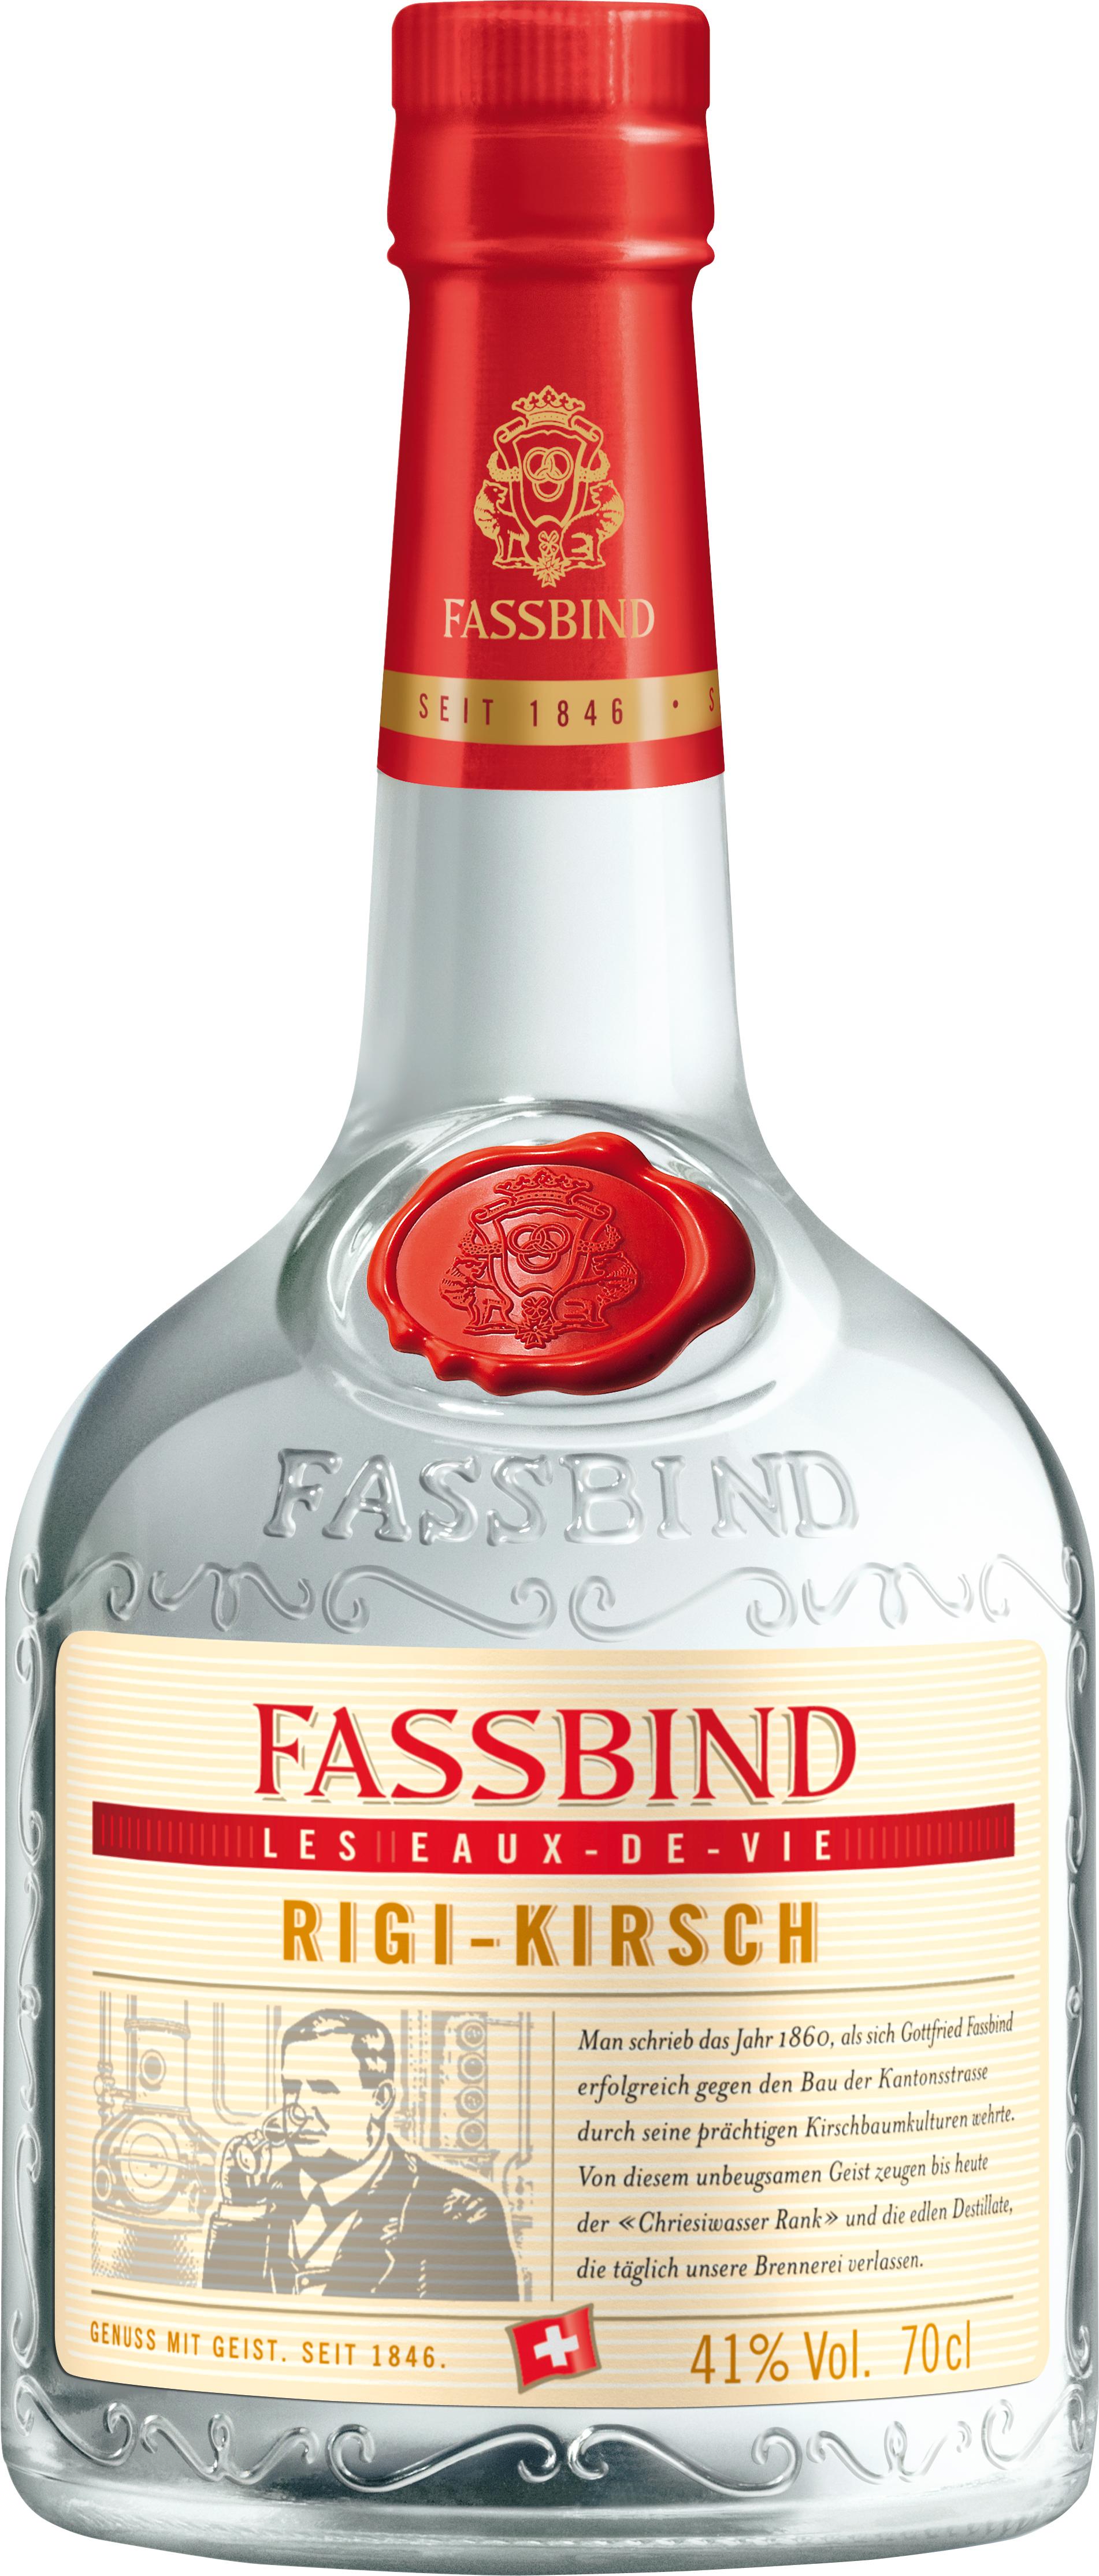 Fassbind Kirschbrand Selection Prestige